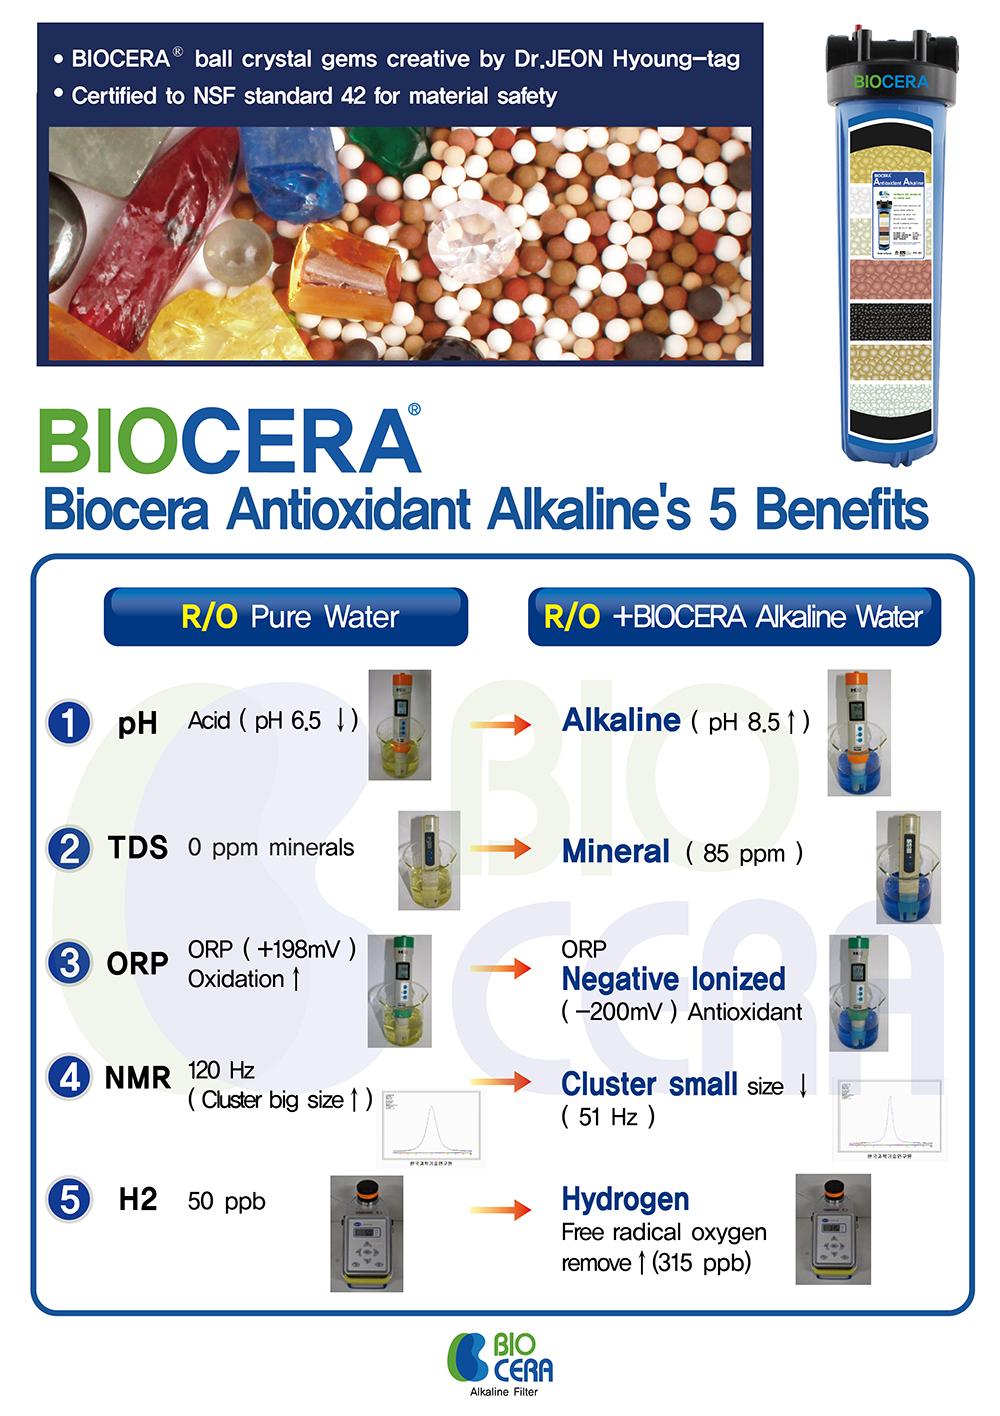 biocerabenefits.jpg